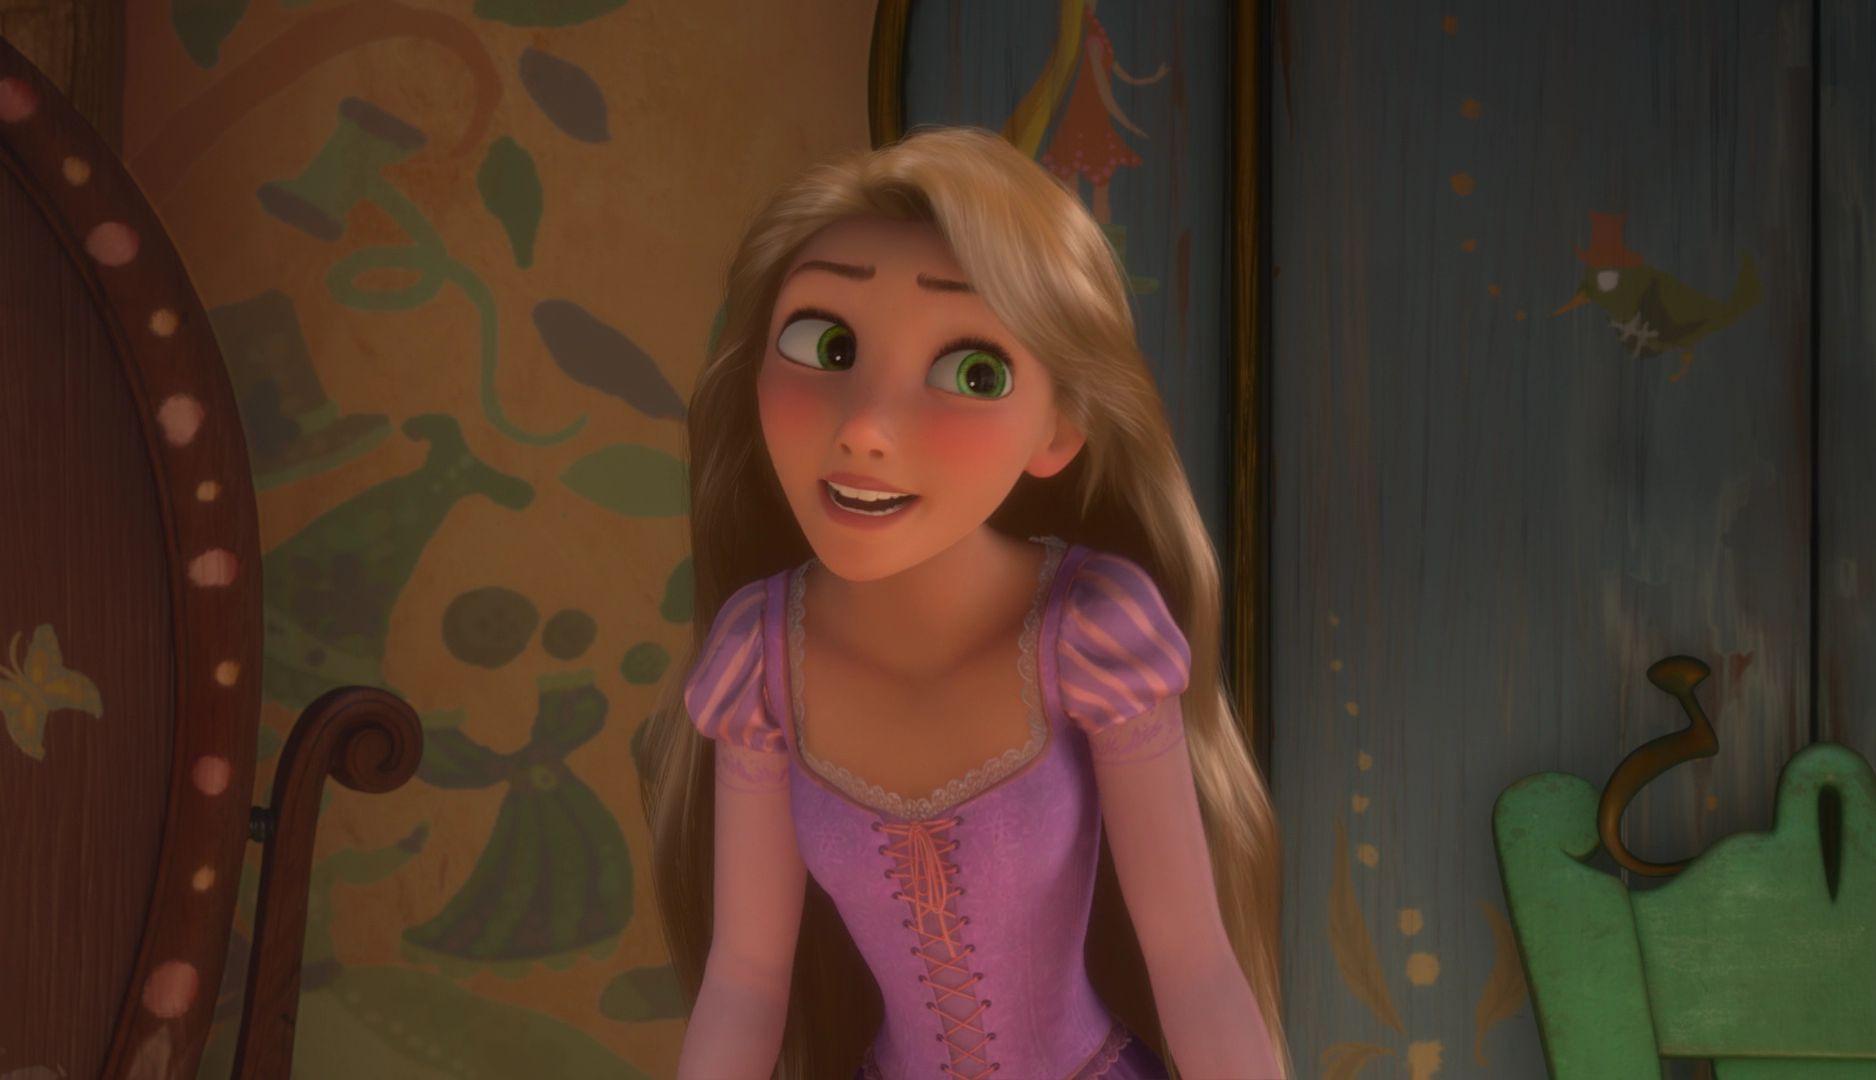 Tangled: Full Movie [Screencaps] - Tangled Image (21684921 ... Disney Rapunzel Screencaps